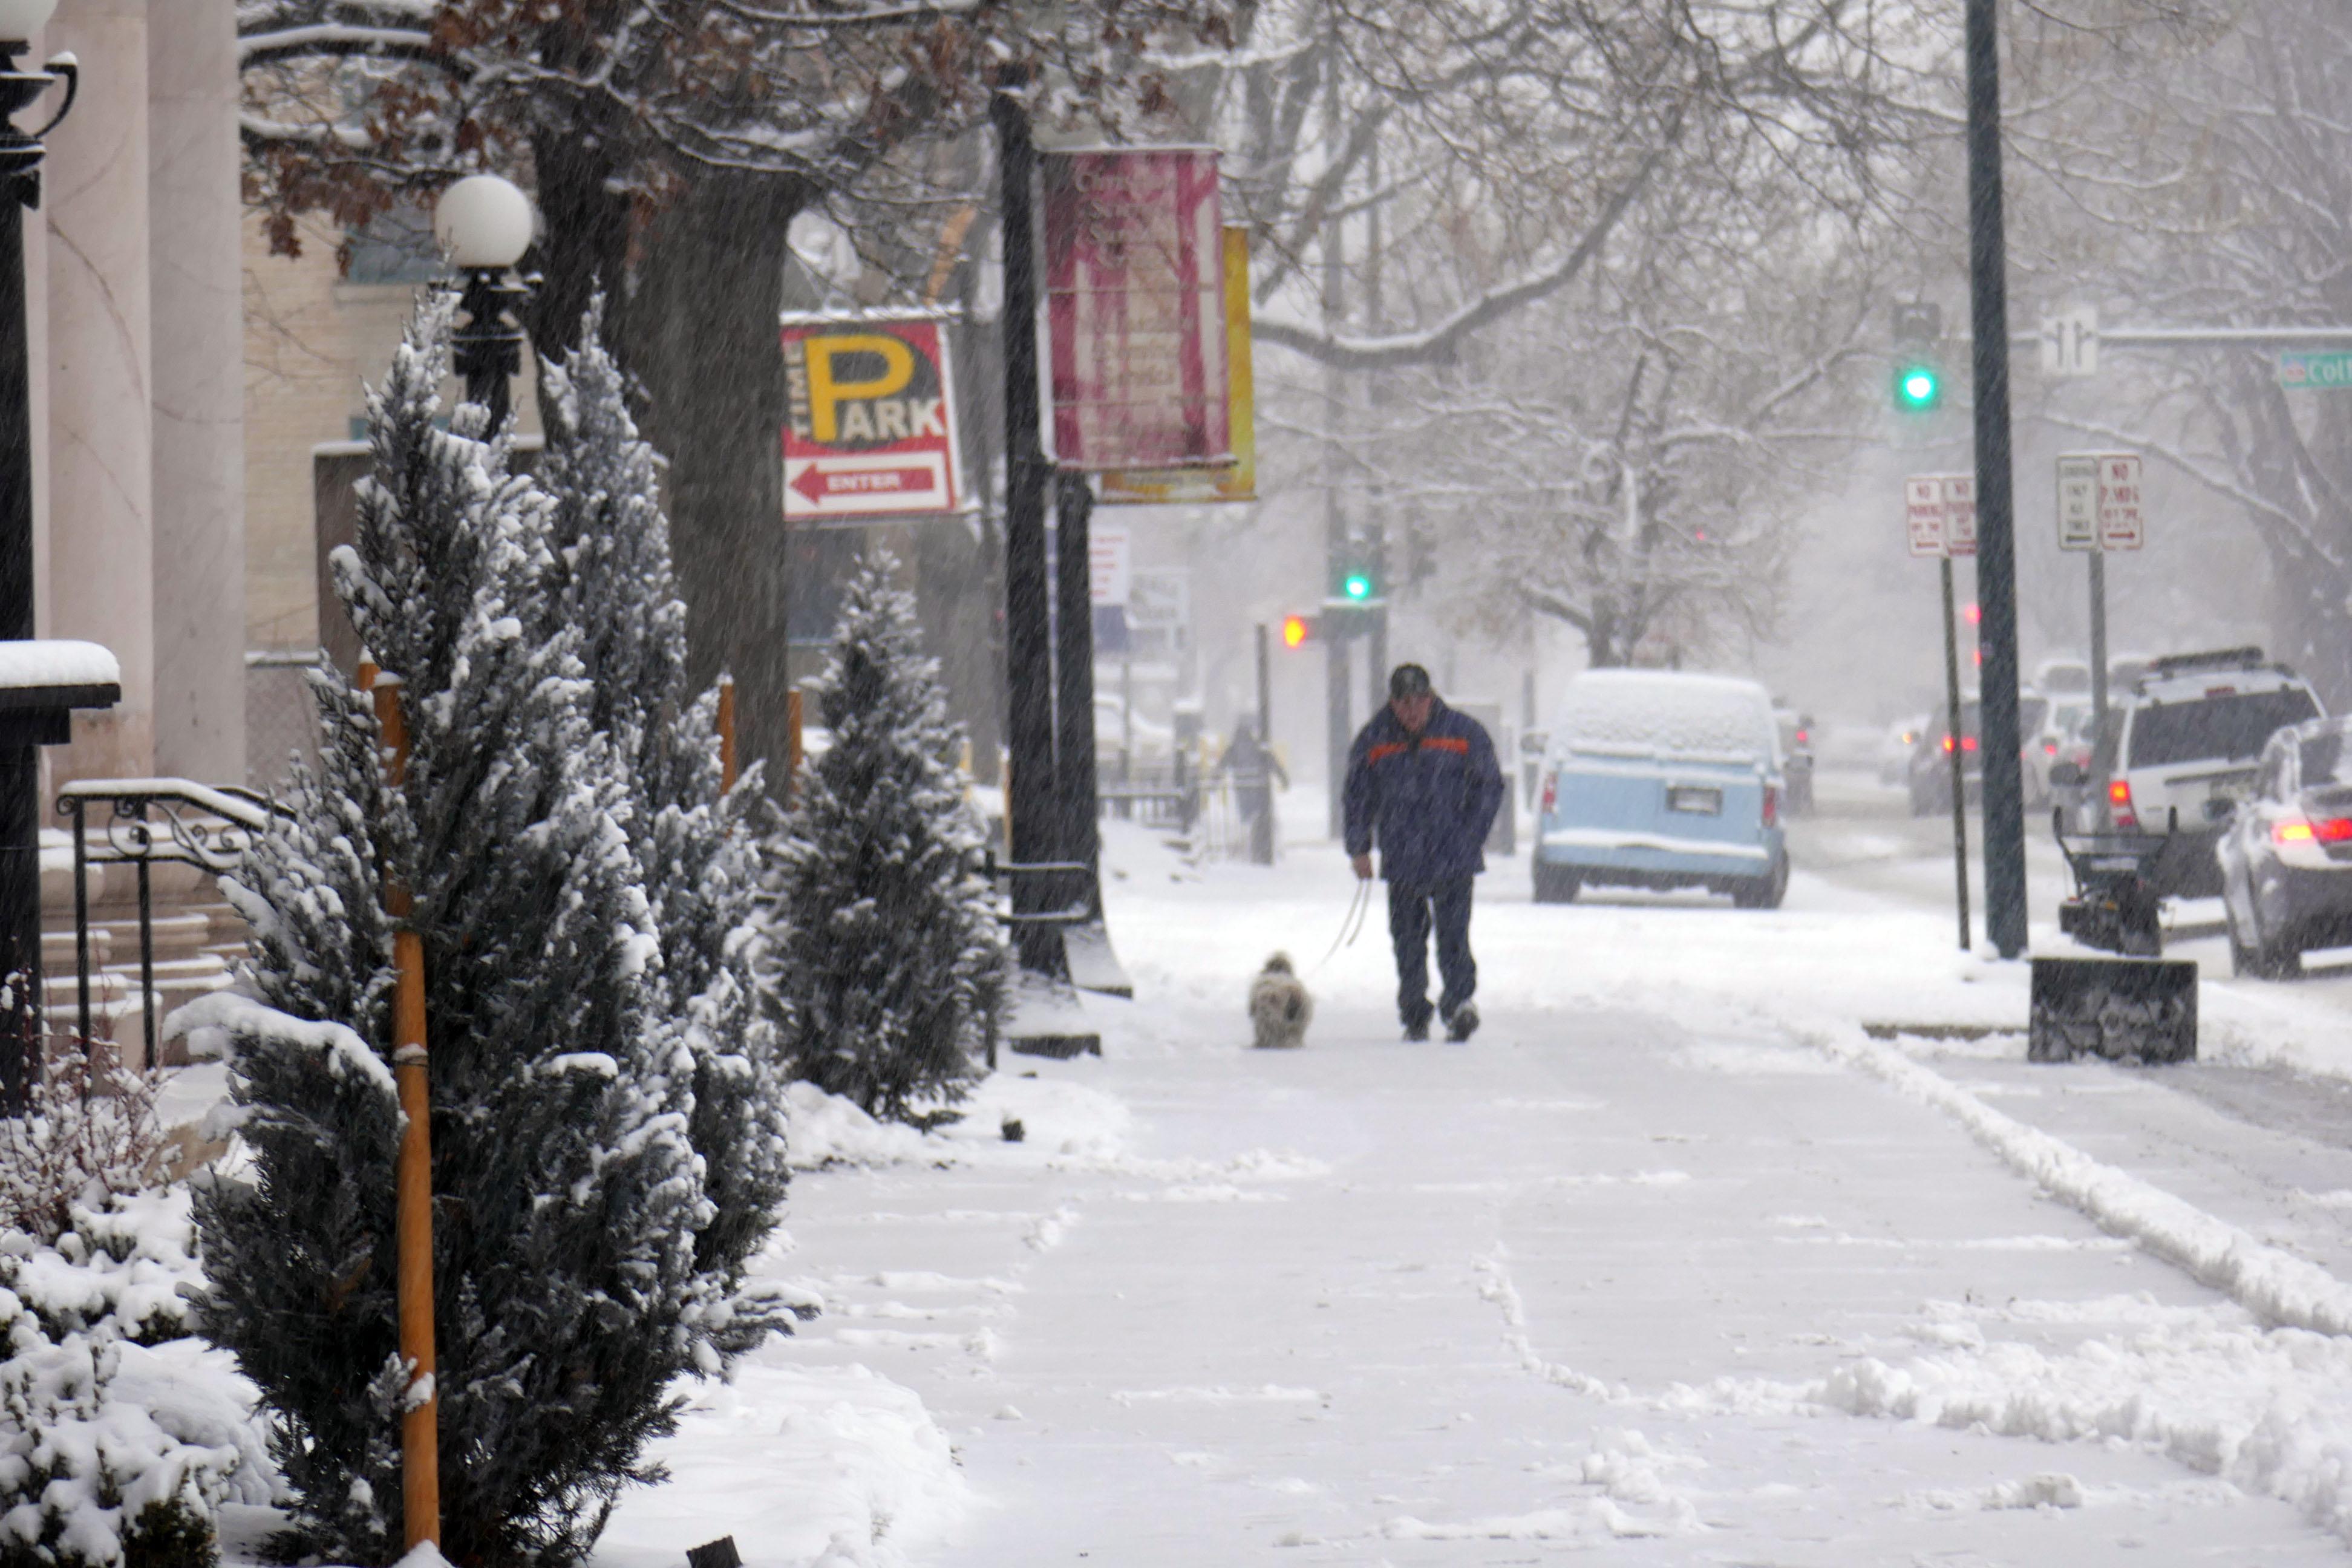 Denver is a snowy city